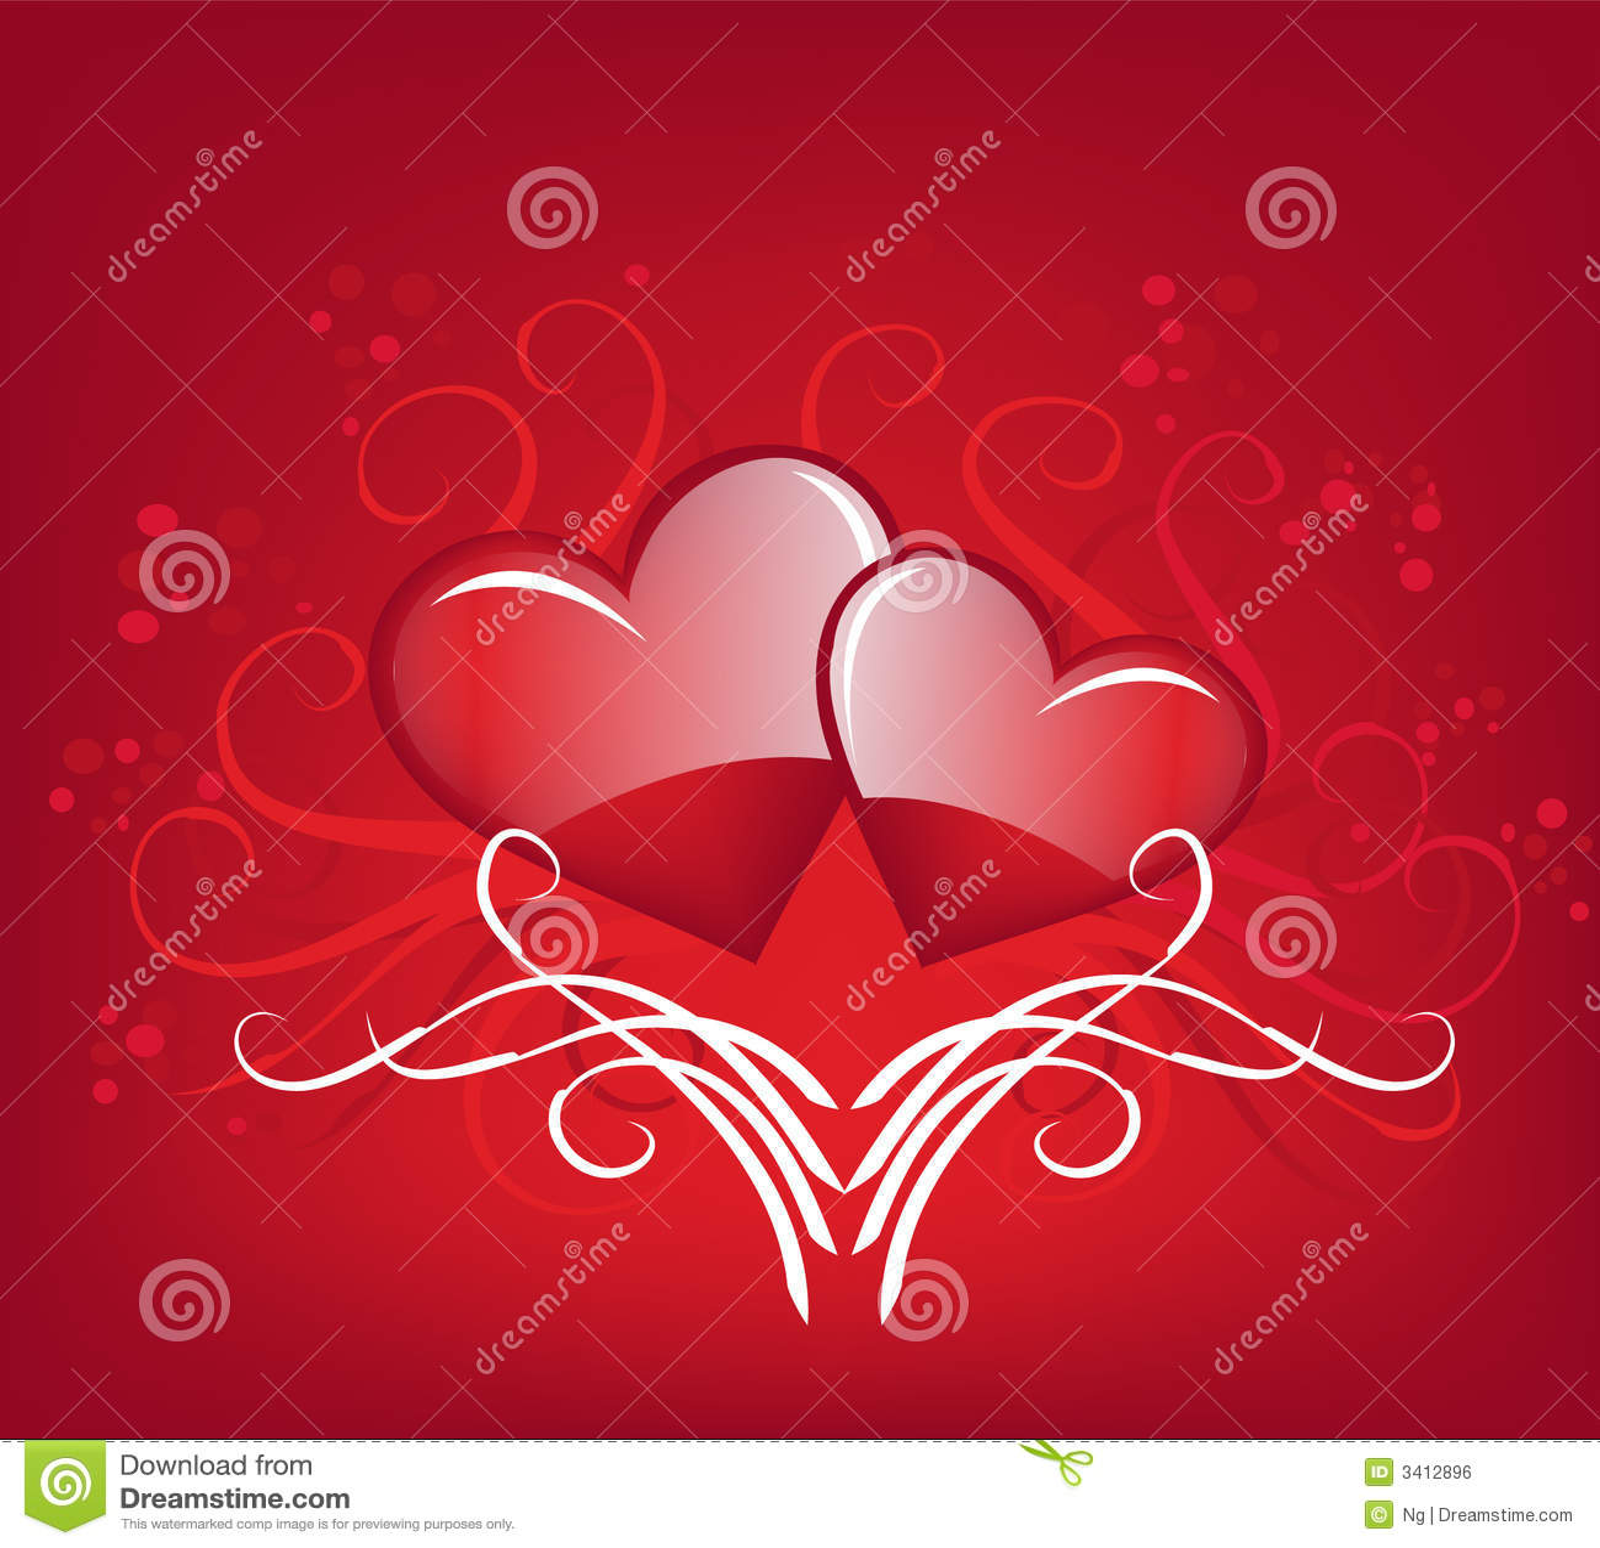 Valentine's Heart Royalty Free Stock Image - Image: 3412896